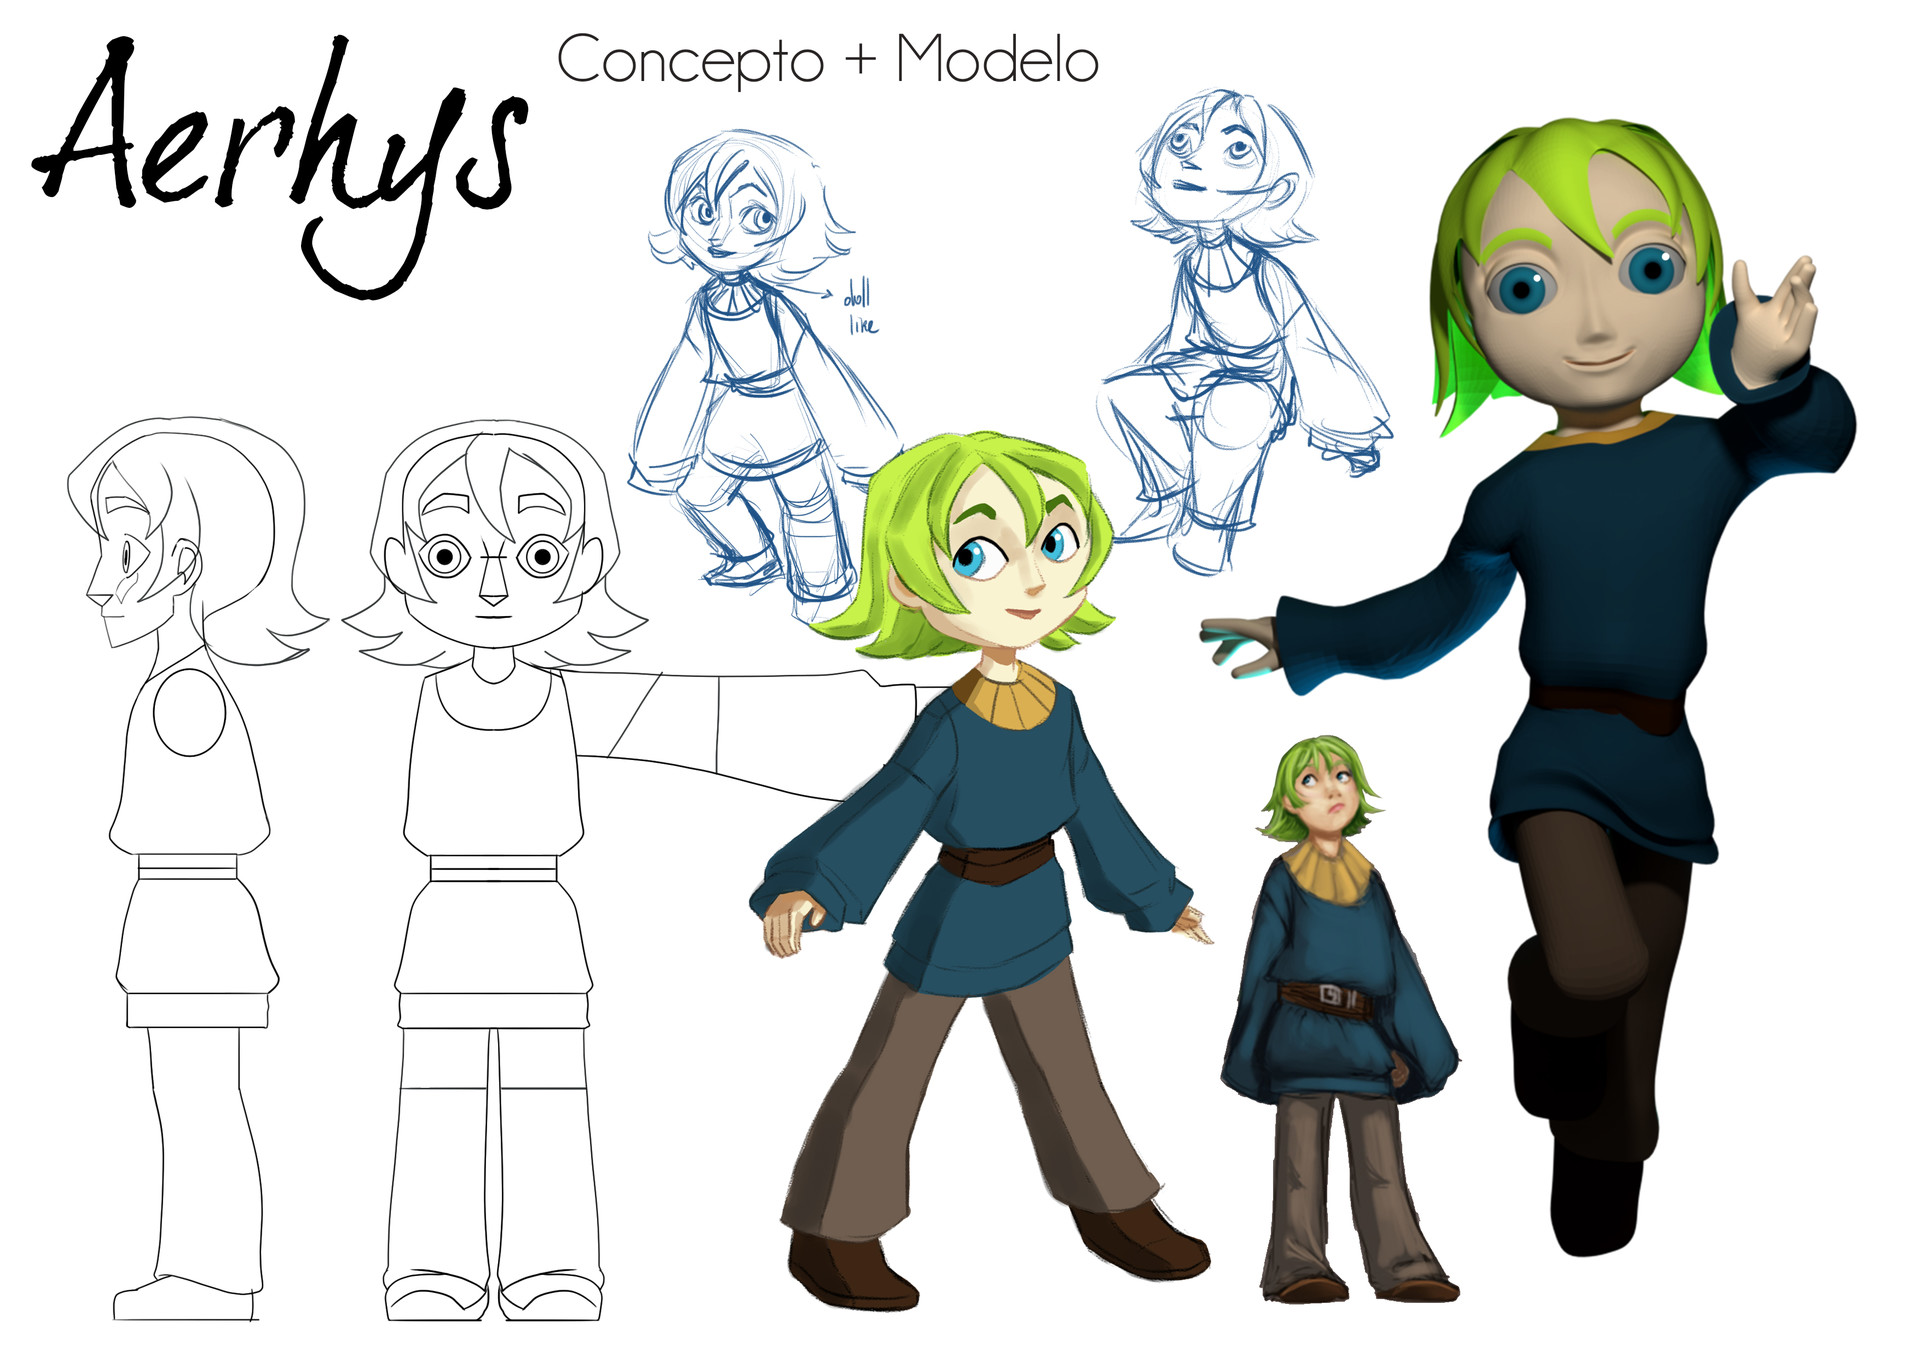 Elizabeth goldring aerhys modelo concept